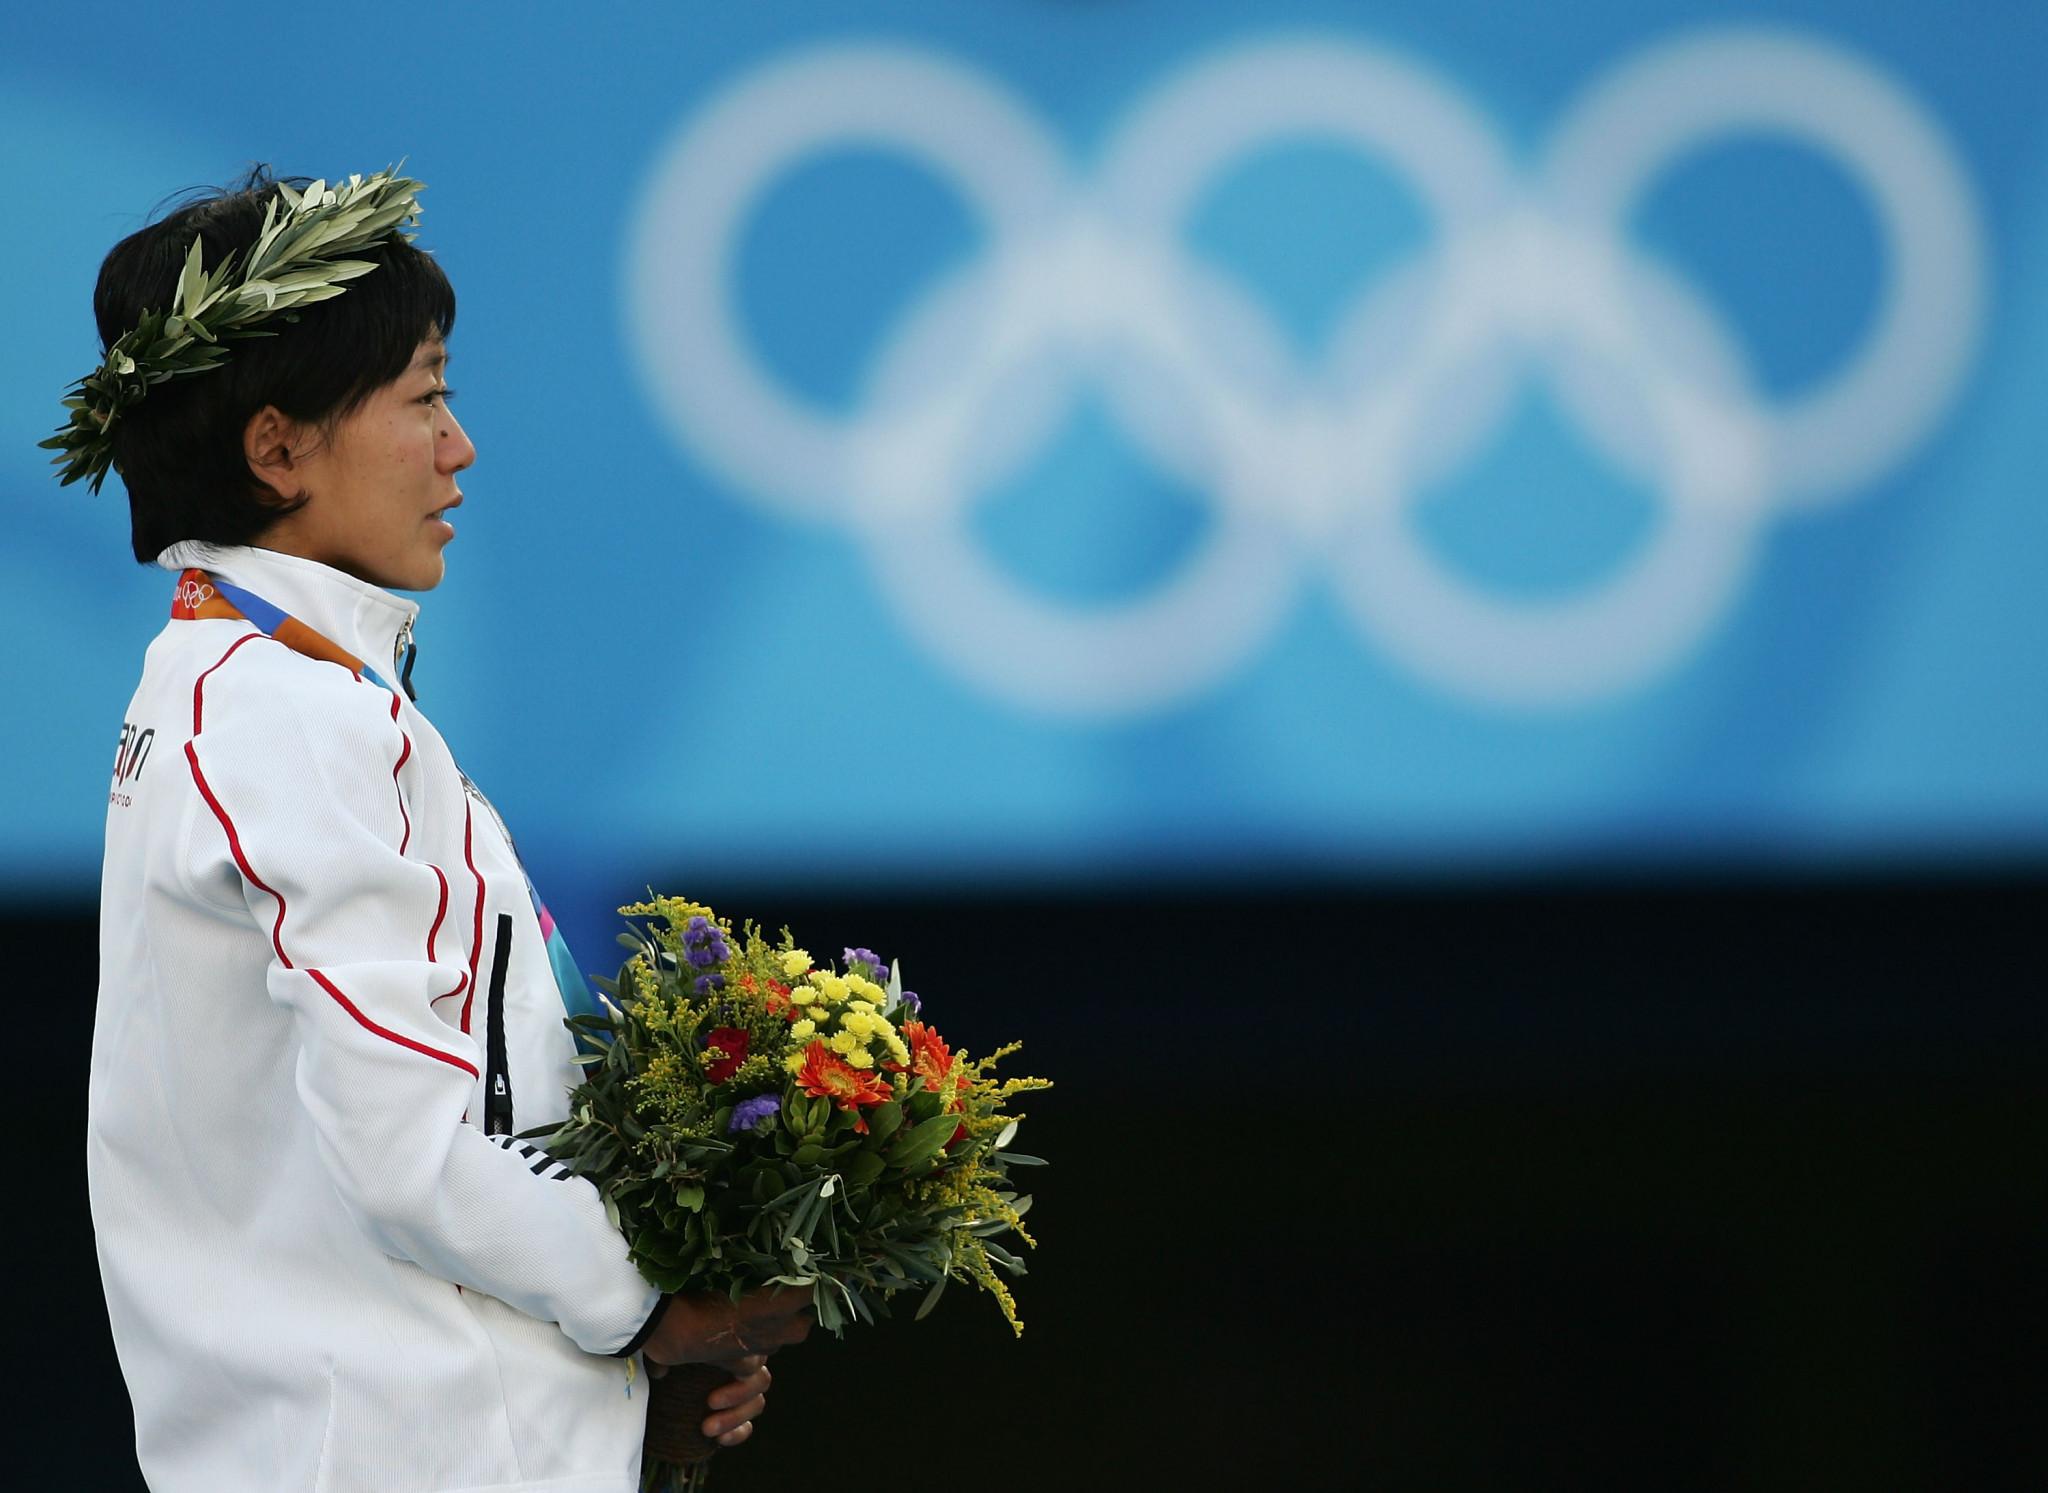 Mizuki Noguchi has fond memories of Greece, having won the women's marathon at Athens 2004 ©Getty Images